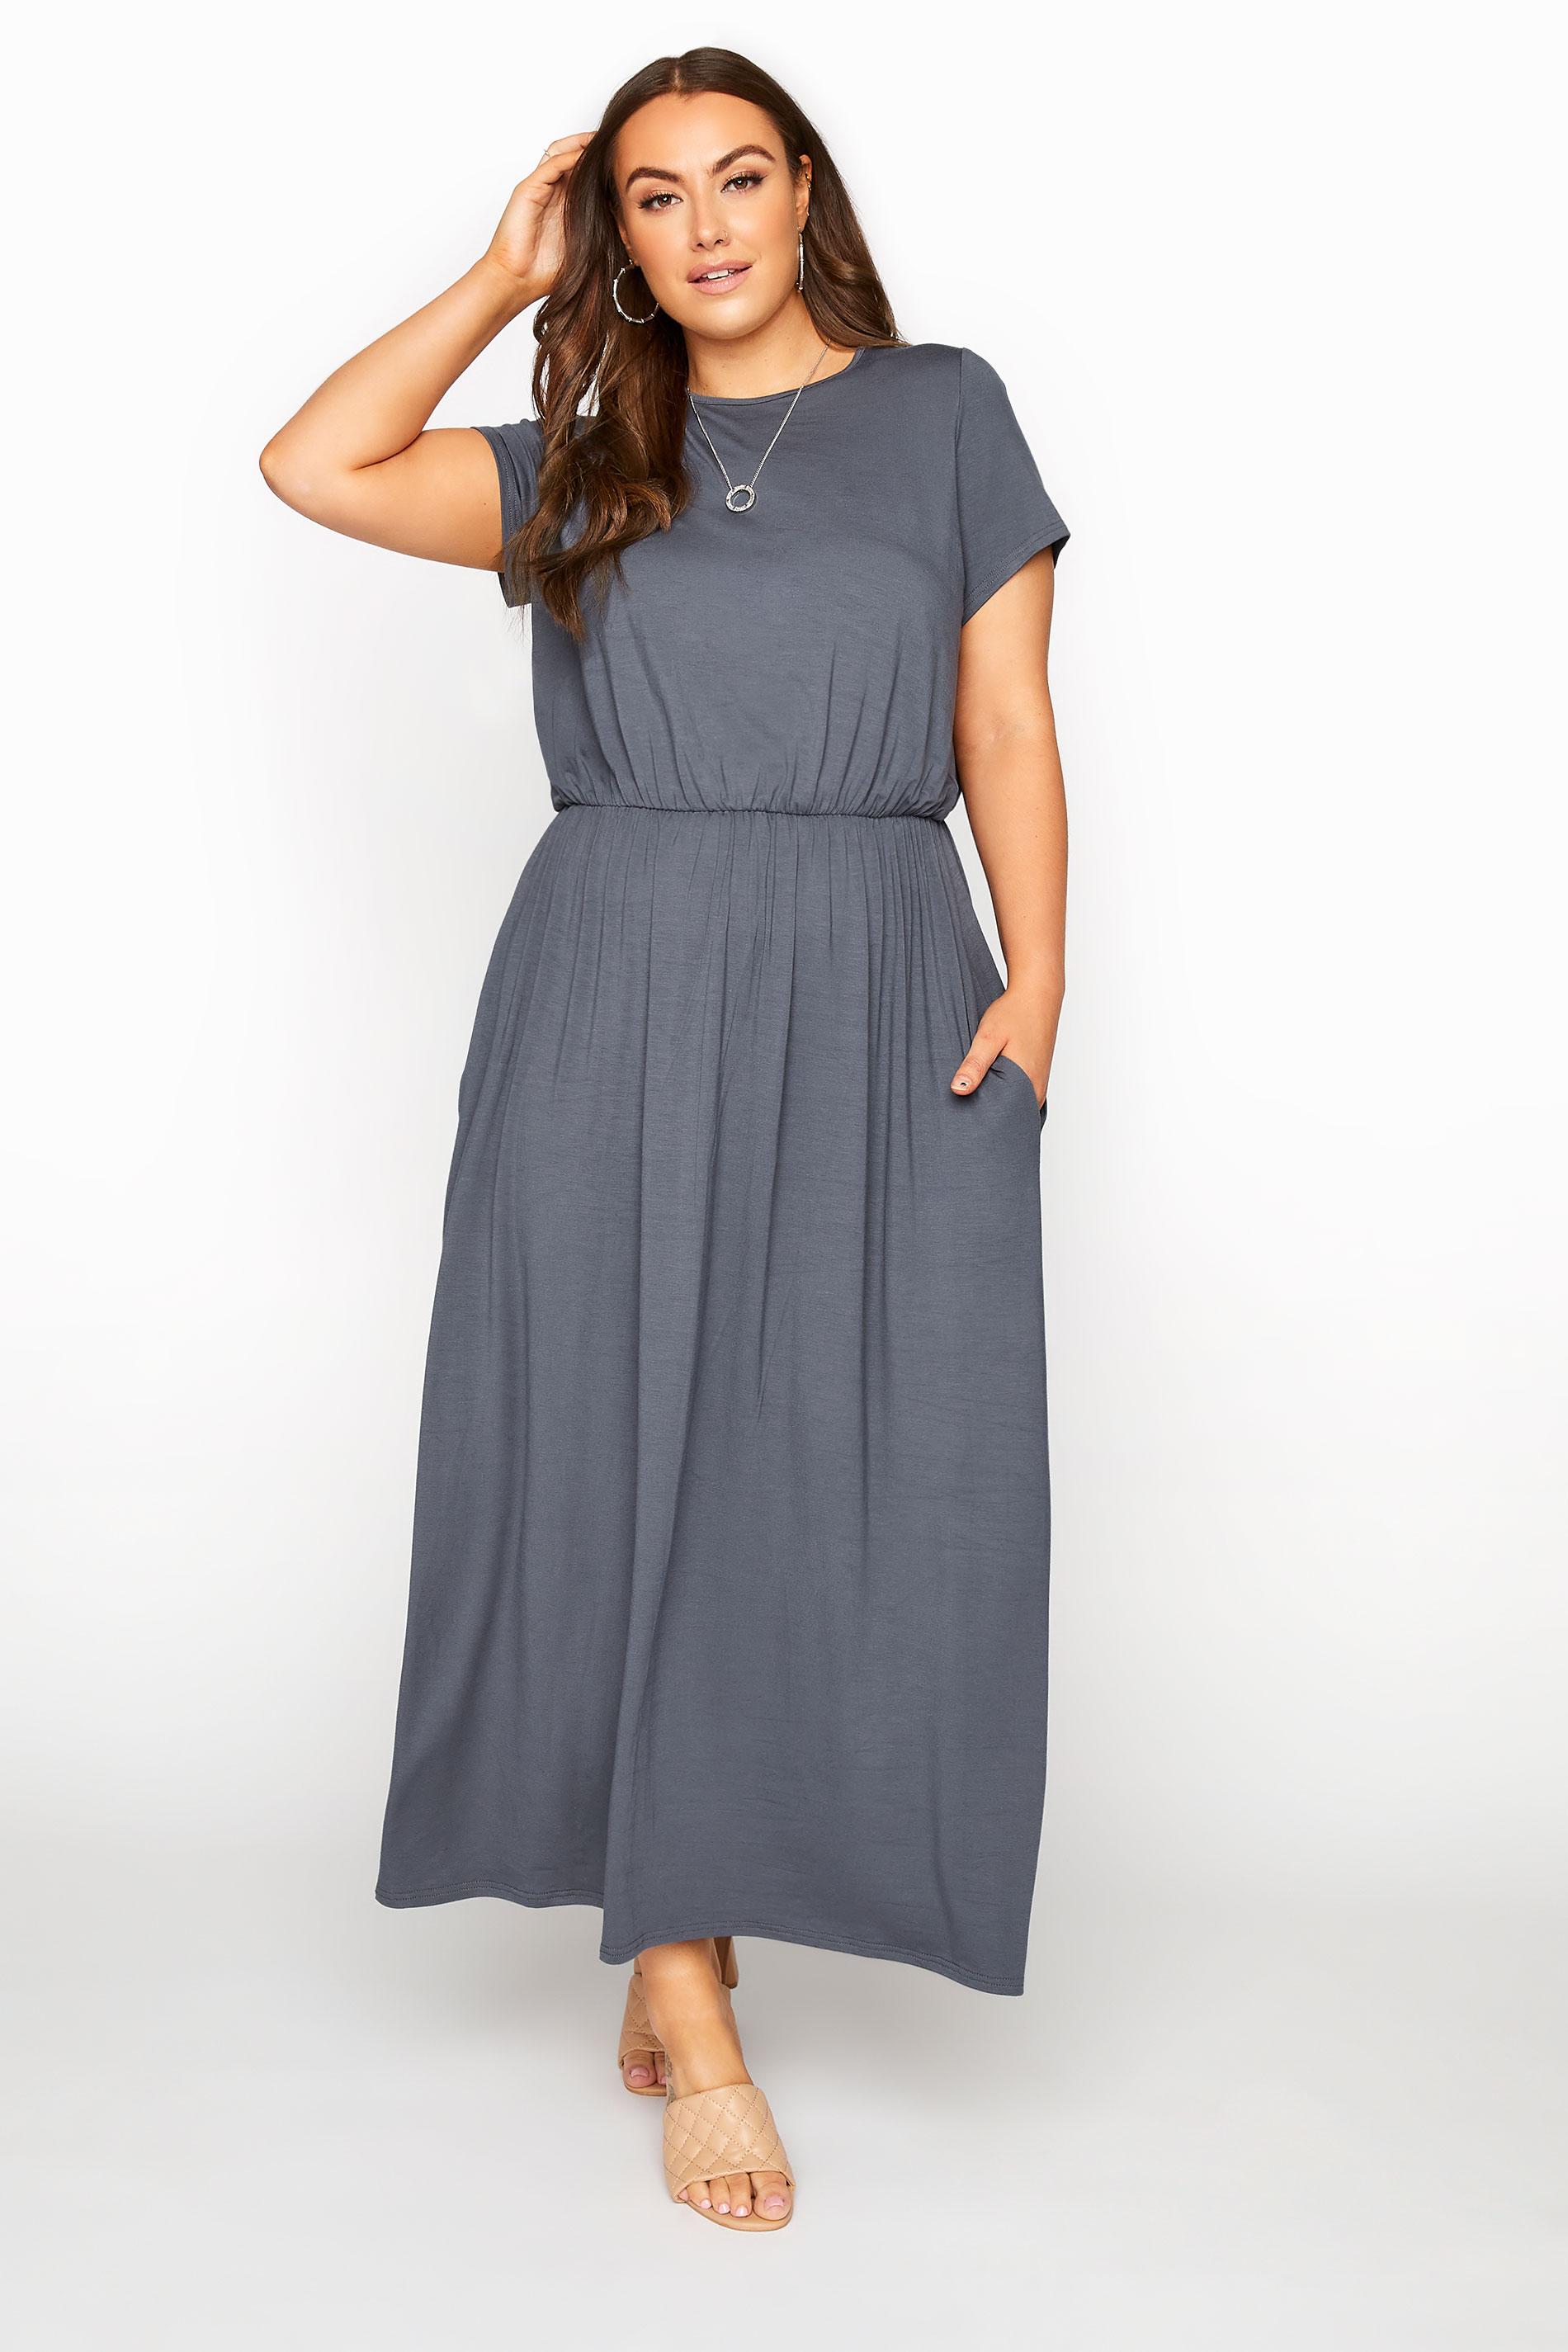 YOURS LONDON Grey Pocket Maxi Dress_A.jpg